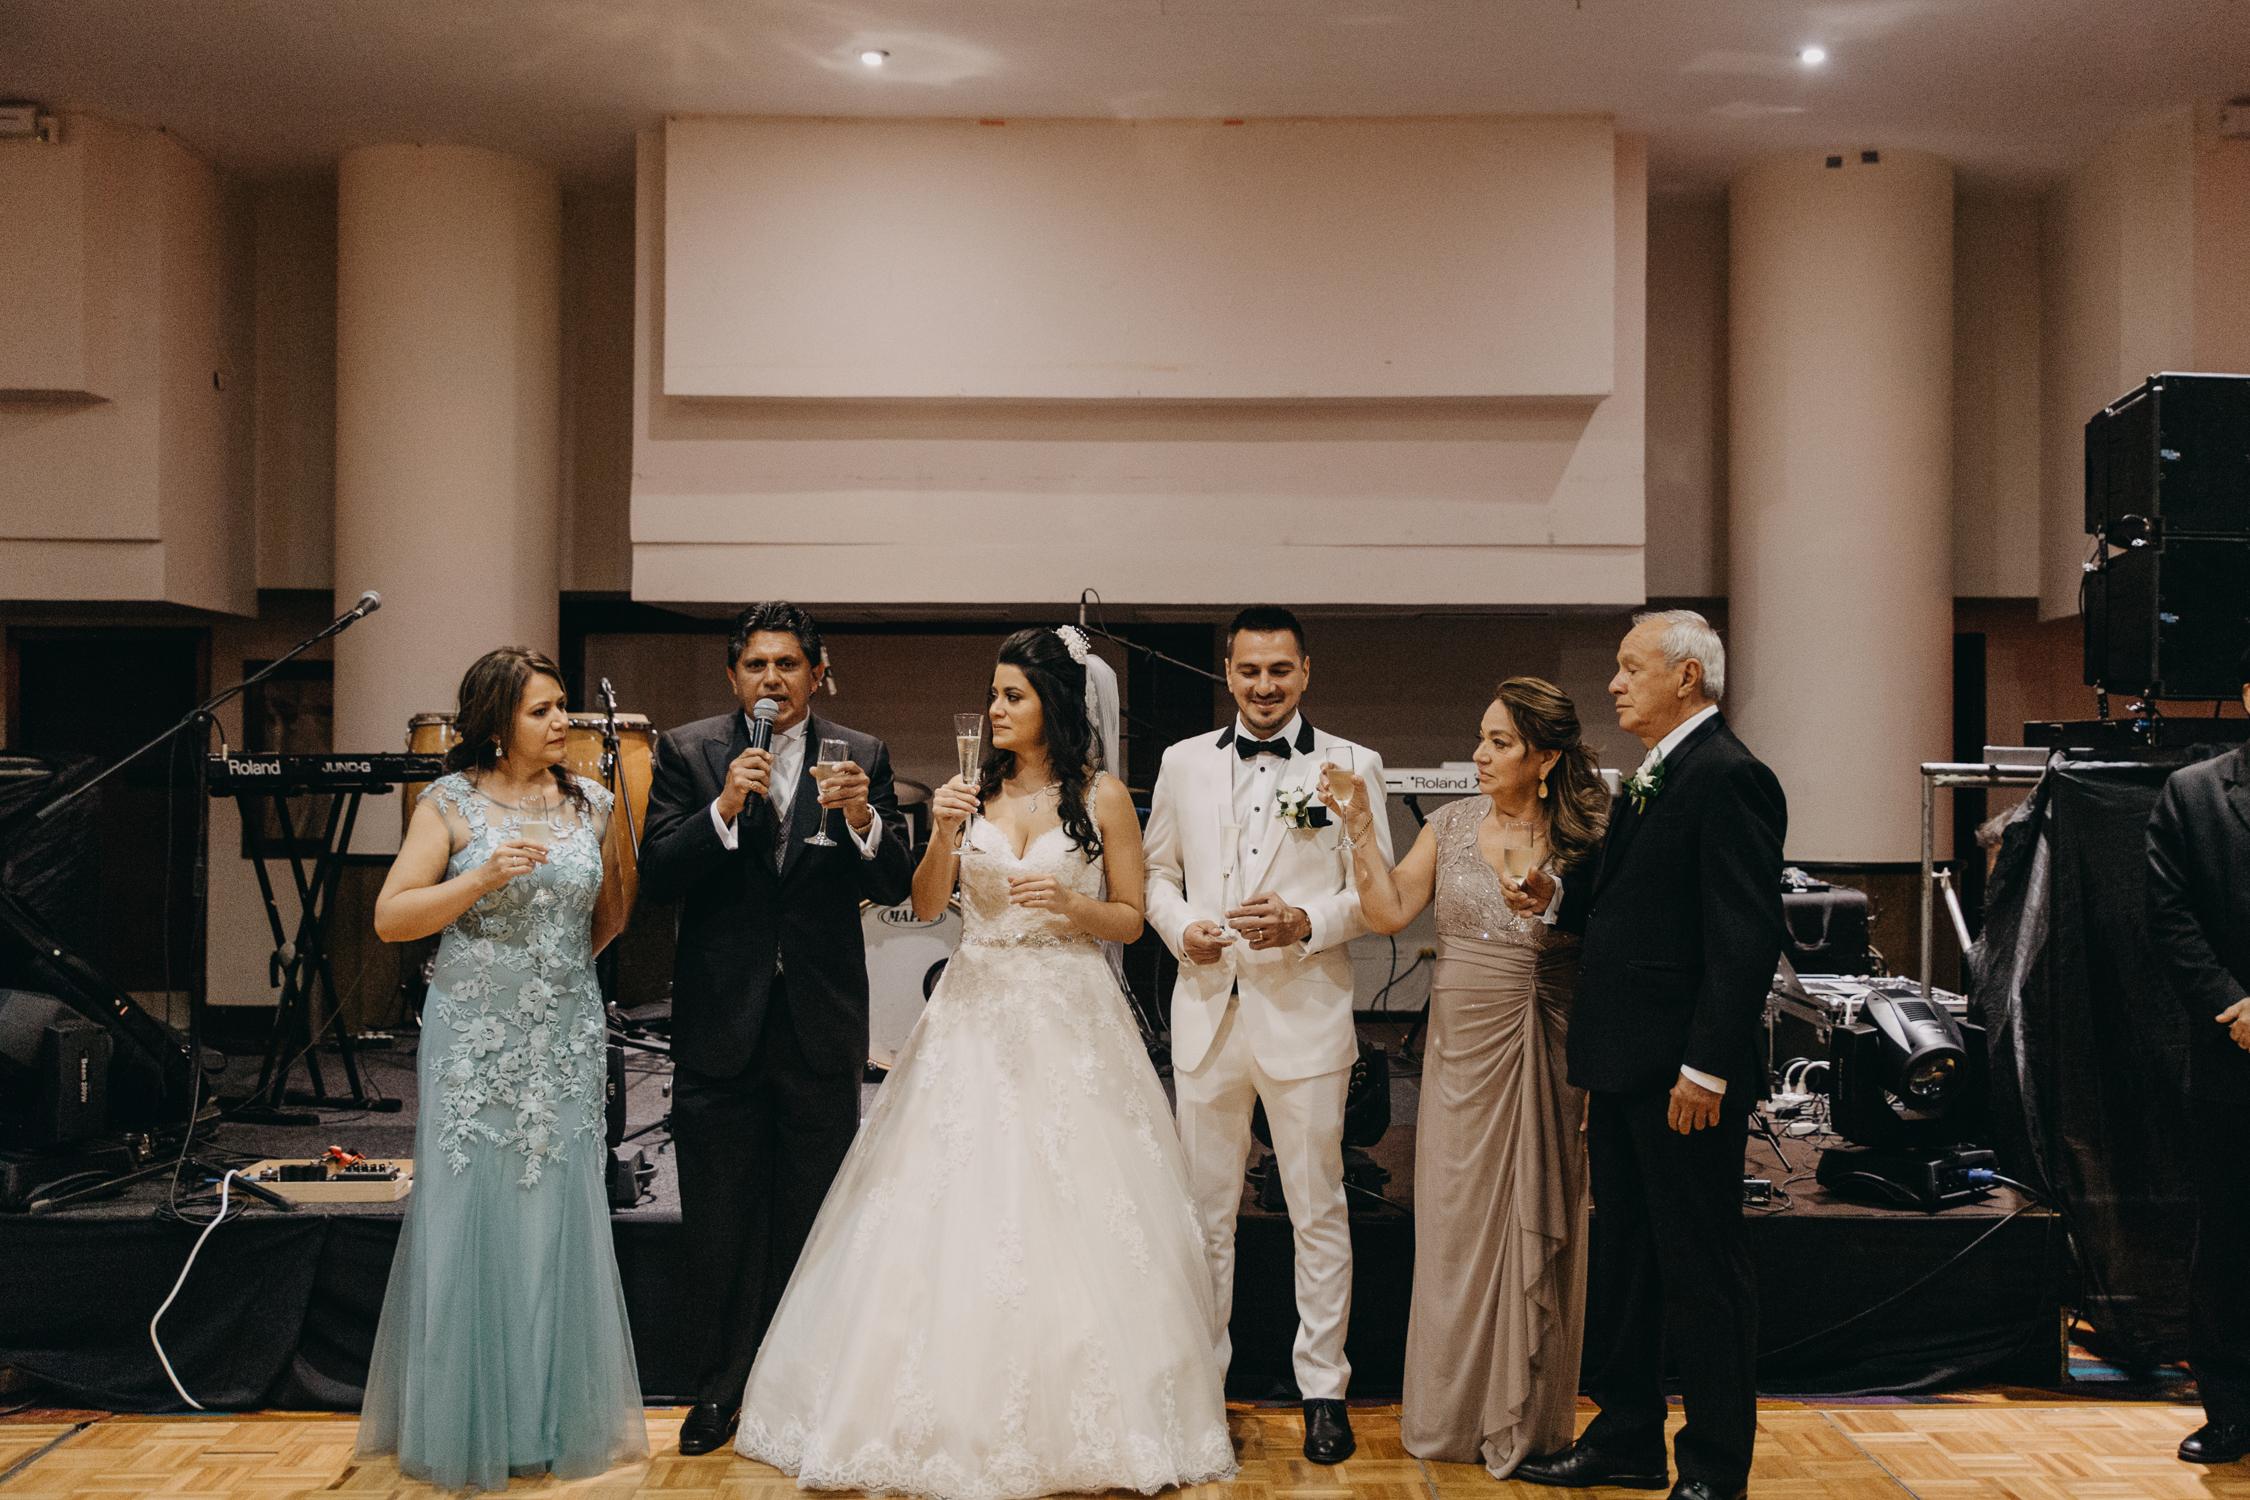 Michelle-Agurto-Fotografia-Bodas-Ecuador-Destination-Wedding-Photographer-Daniela-Dirk-44.JPG